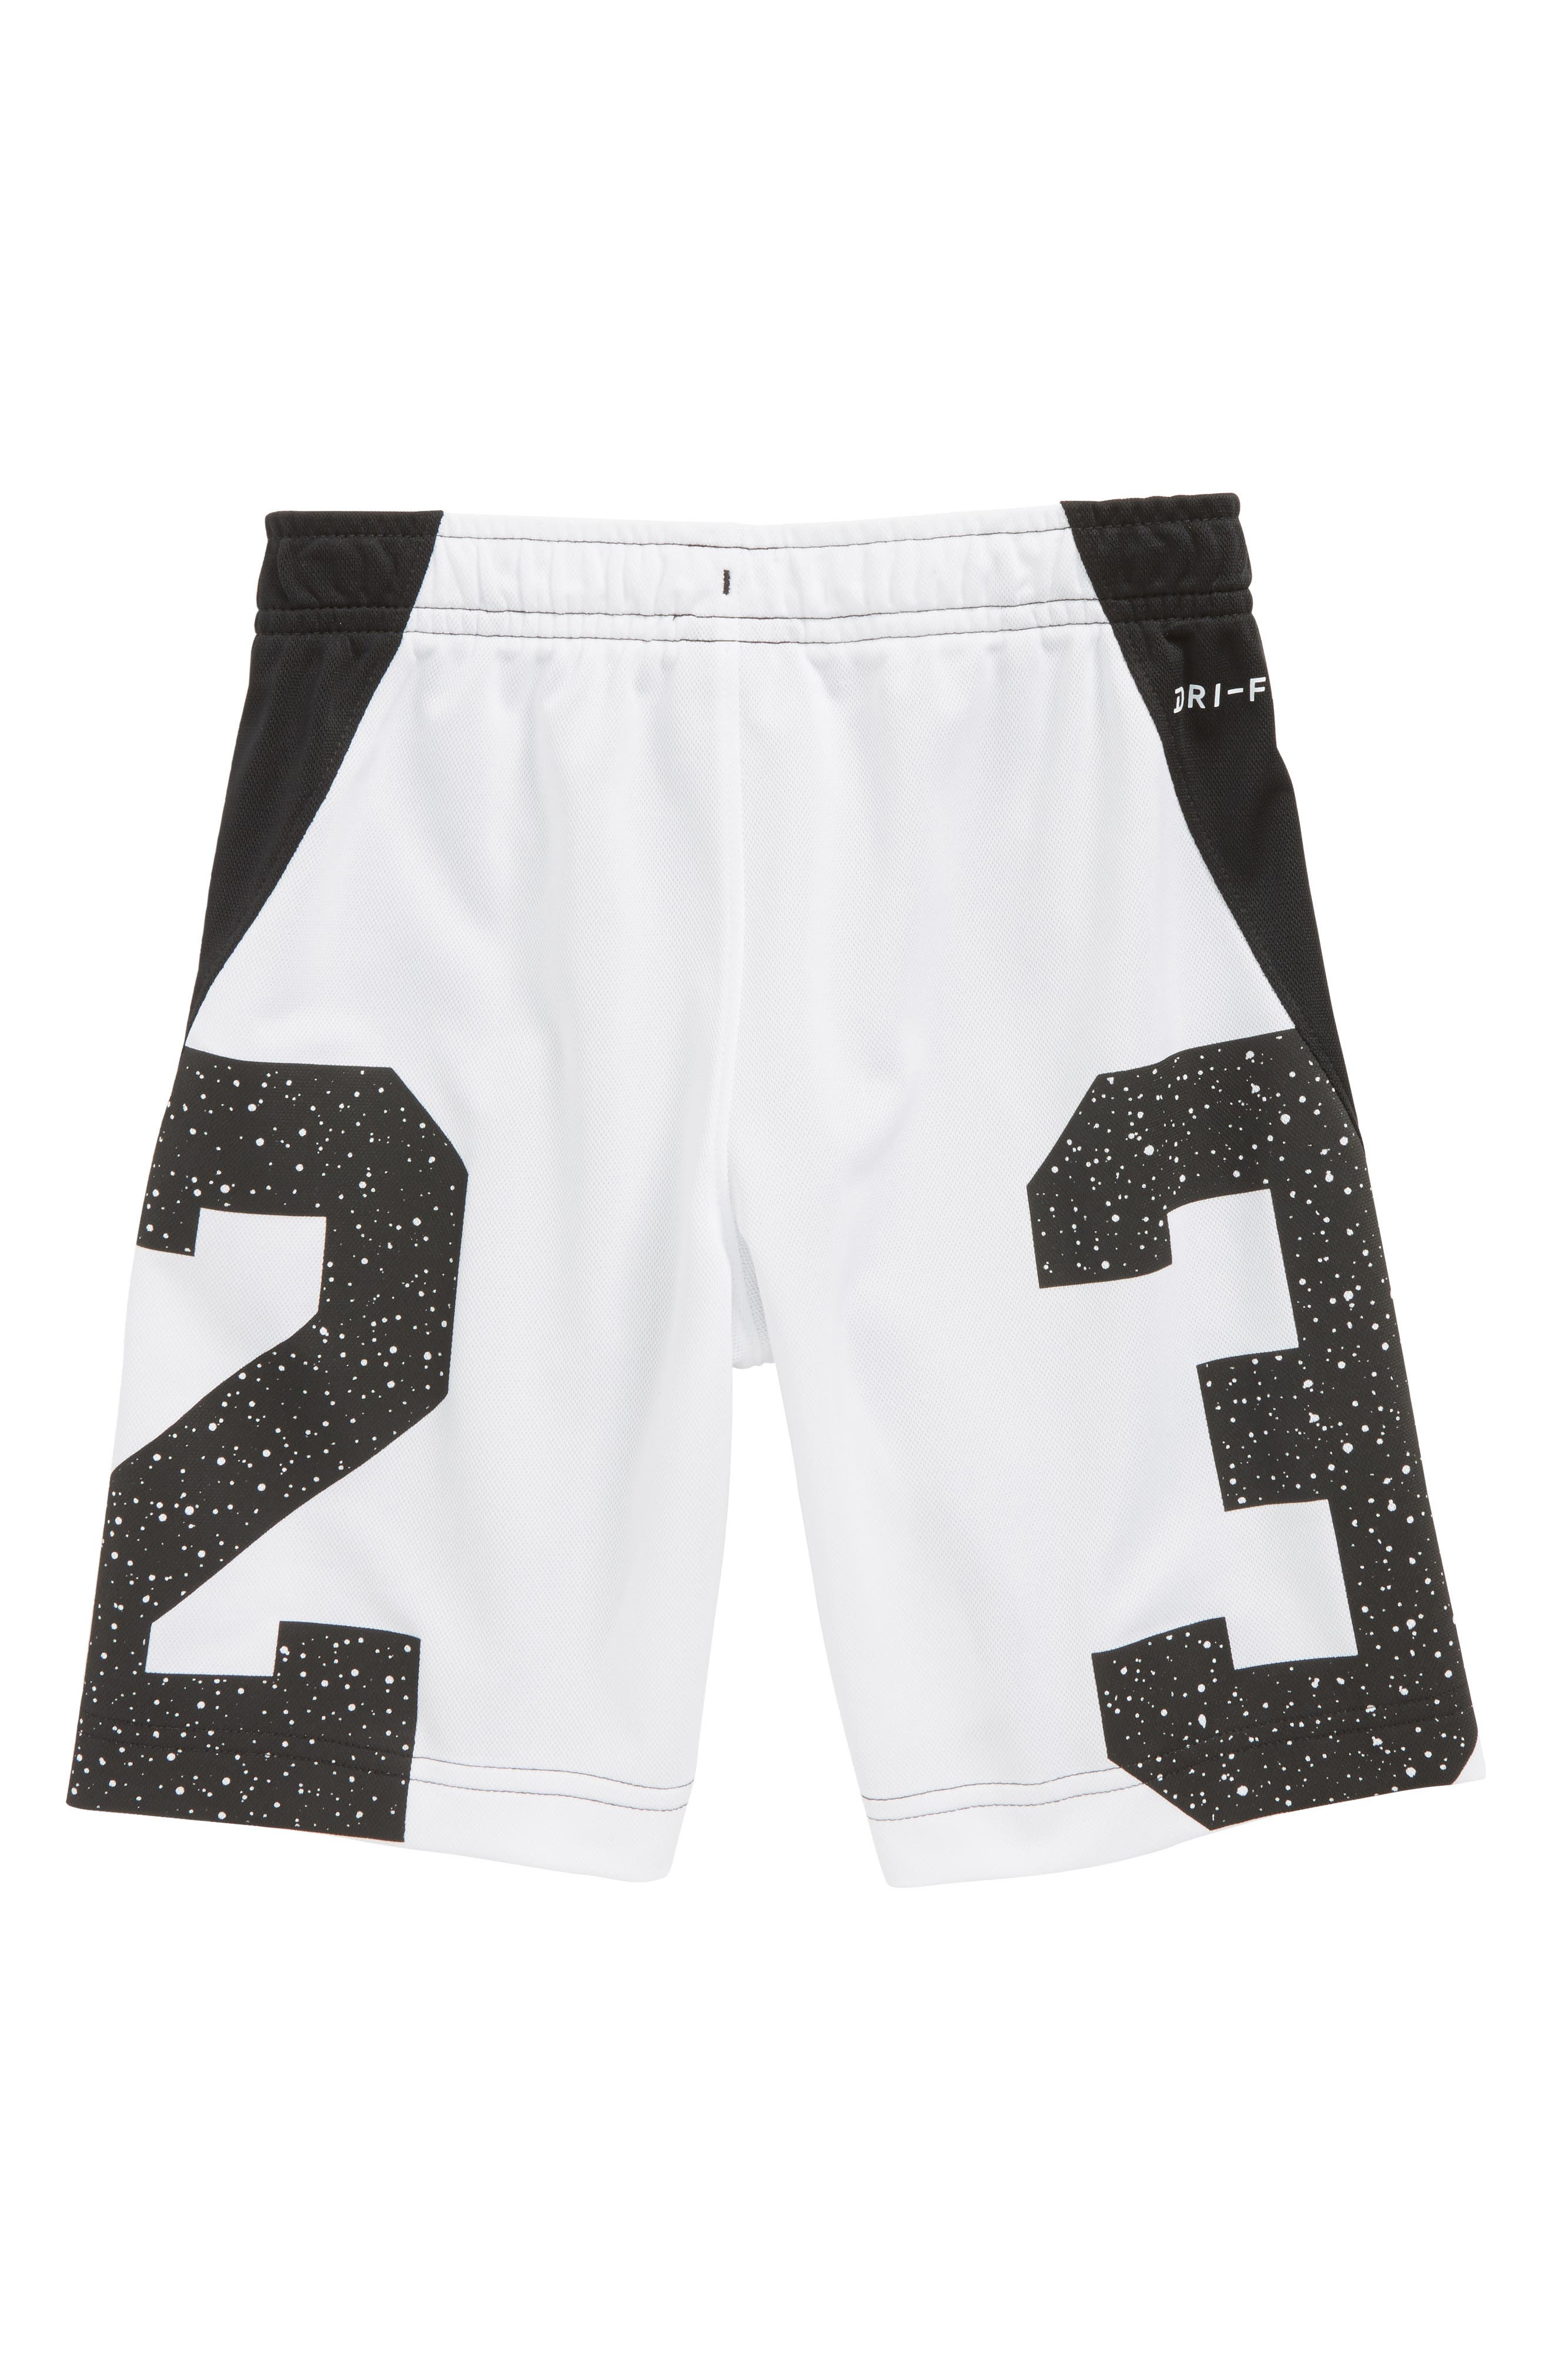 Jordan Dry Speckle 23 Training Shorts,                             Alternate thumbnail 2, color,                             001